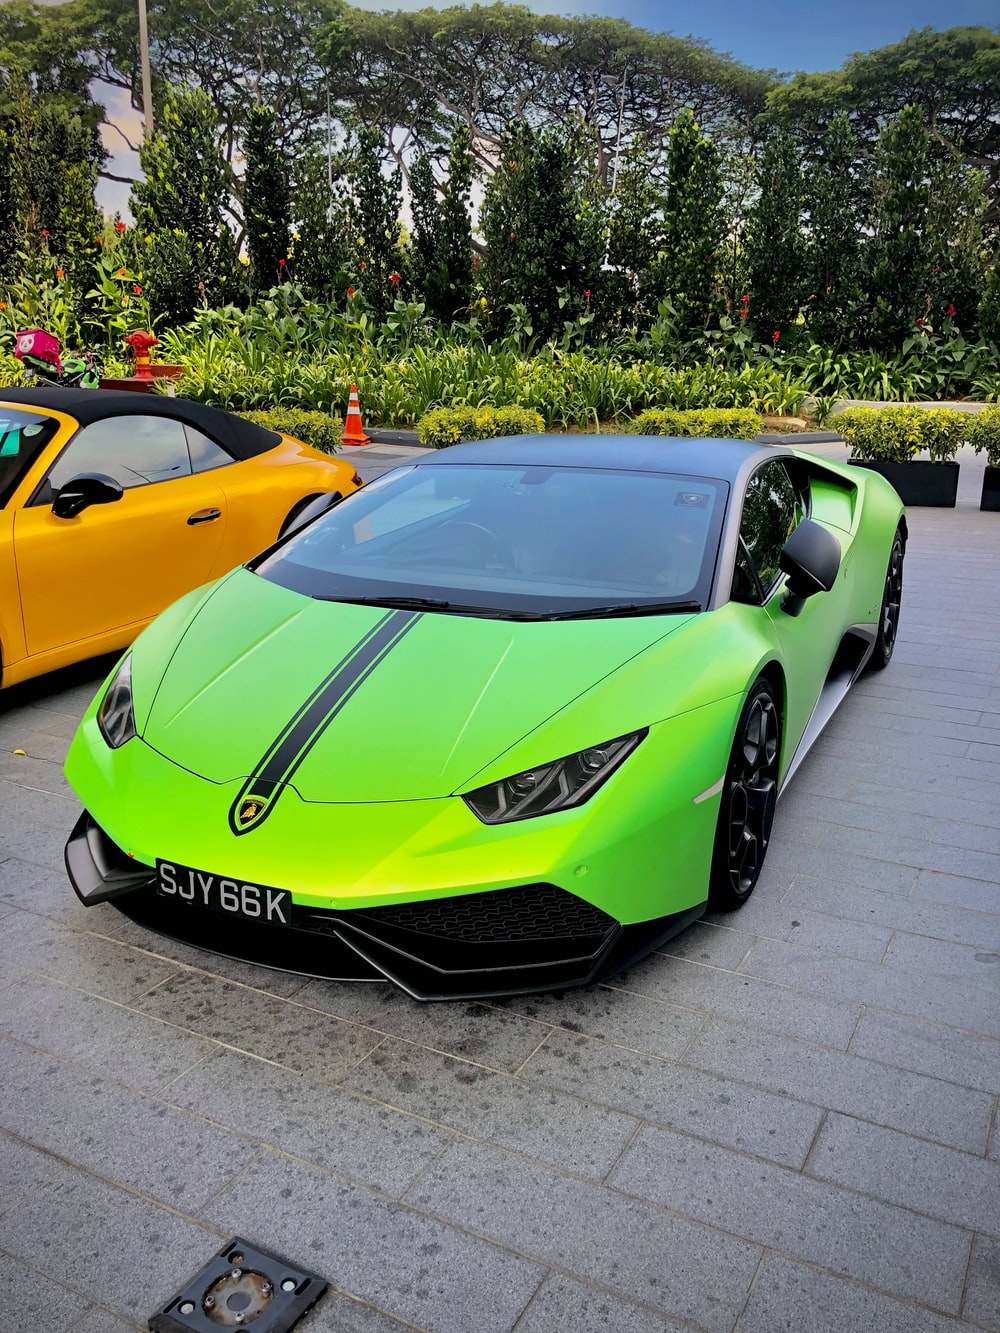 Green And Black Ferrari Parked Near Yellow Car Photo Free Automobile Image On Unsplash